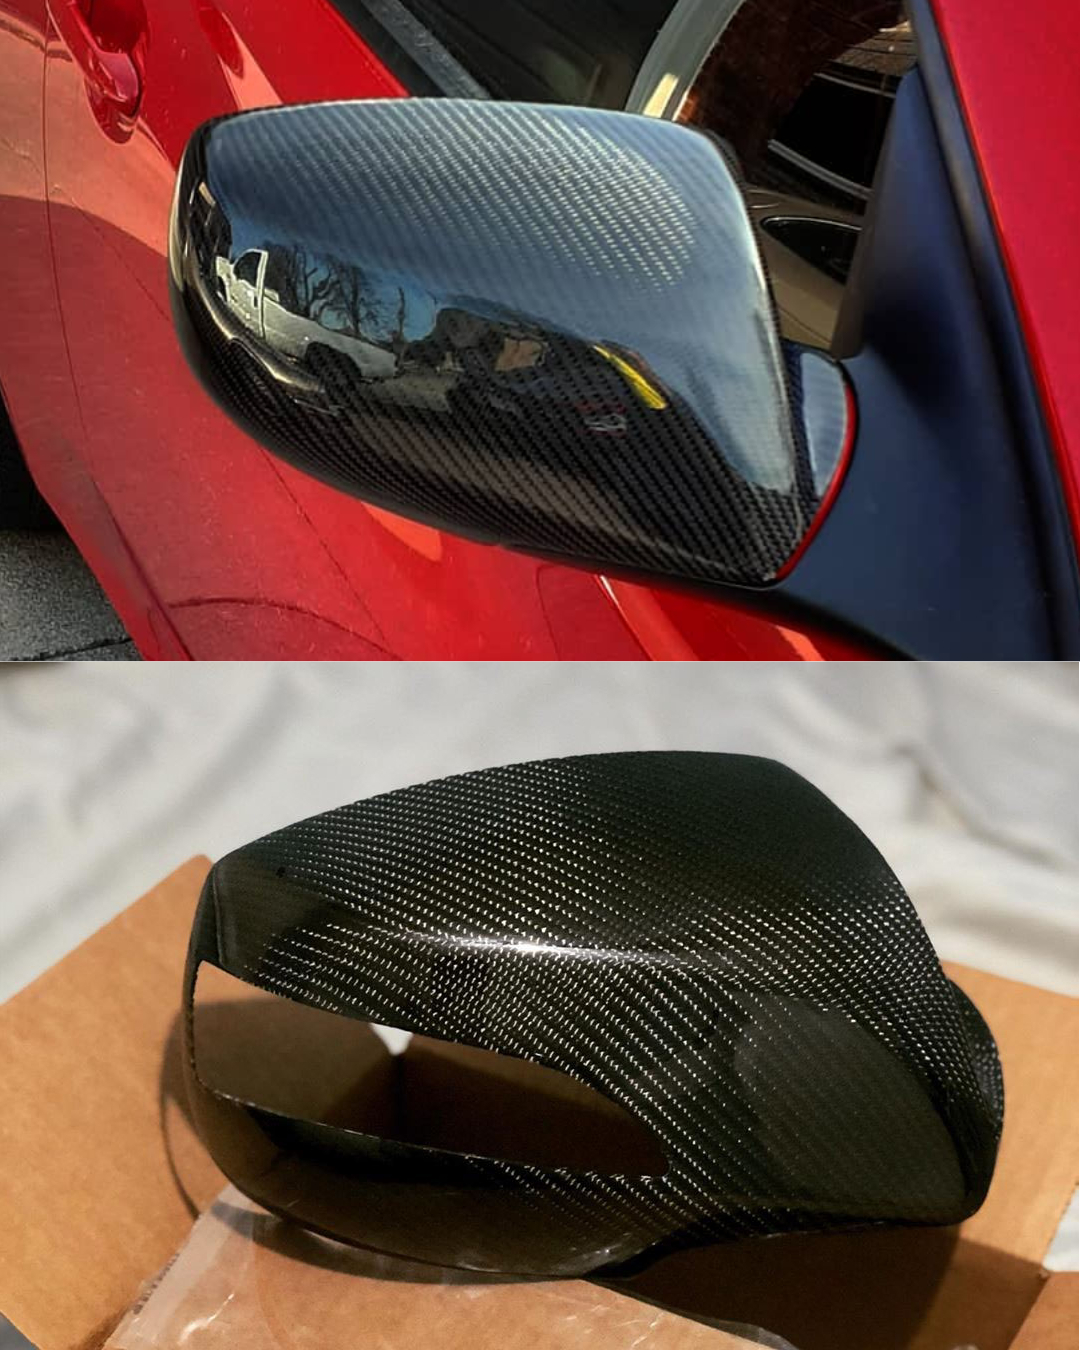 Genesis coupe carbon fiber mirror covers